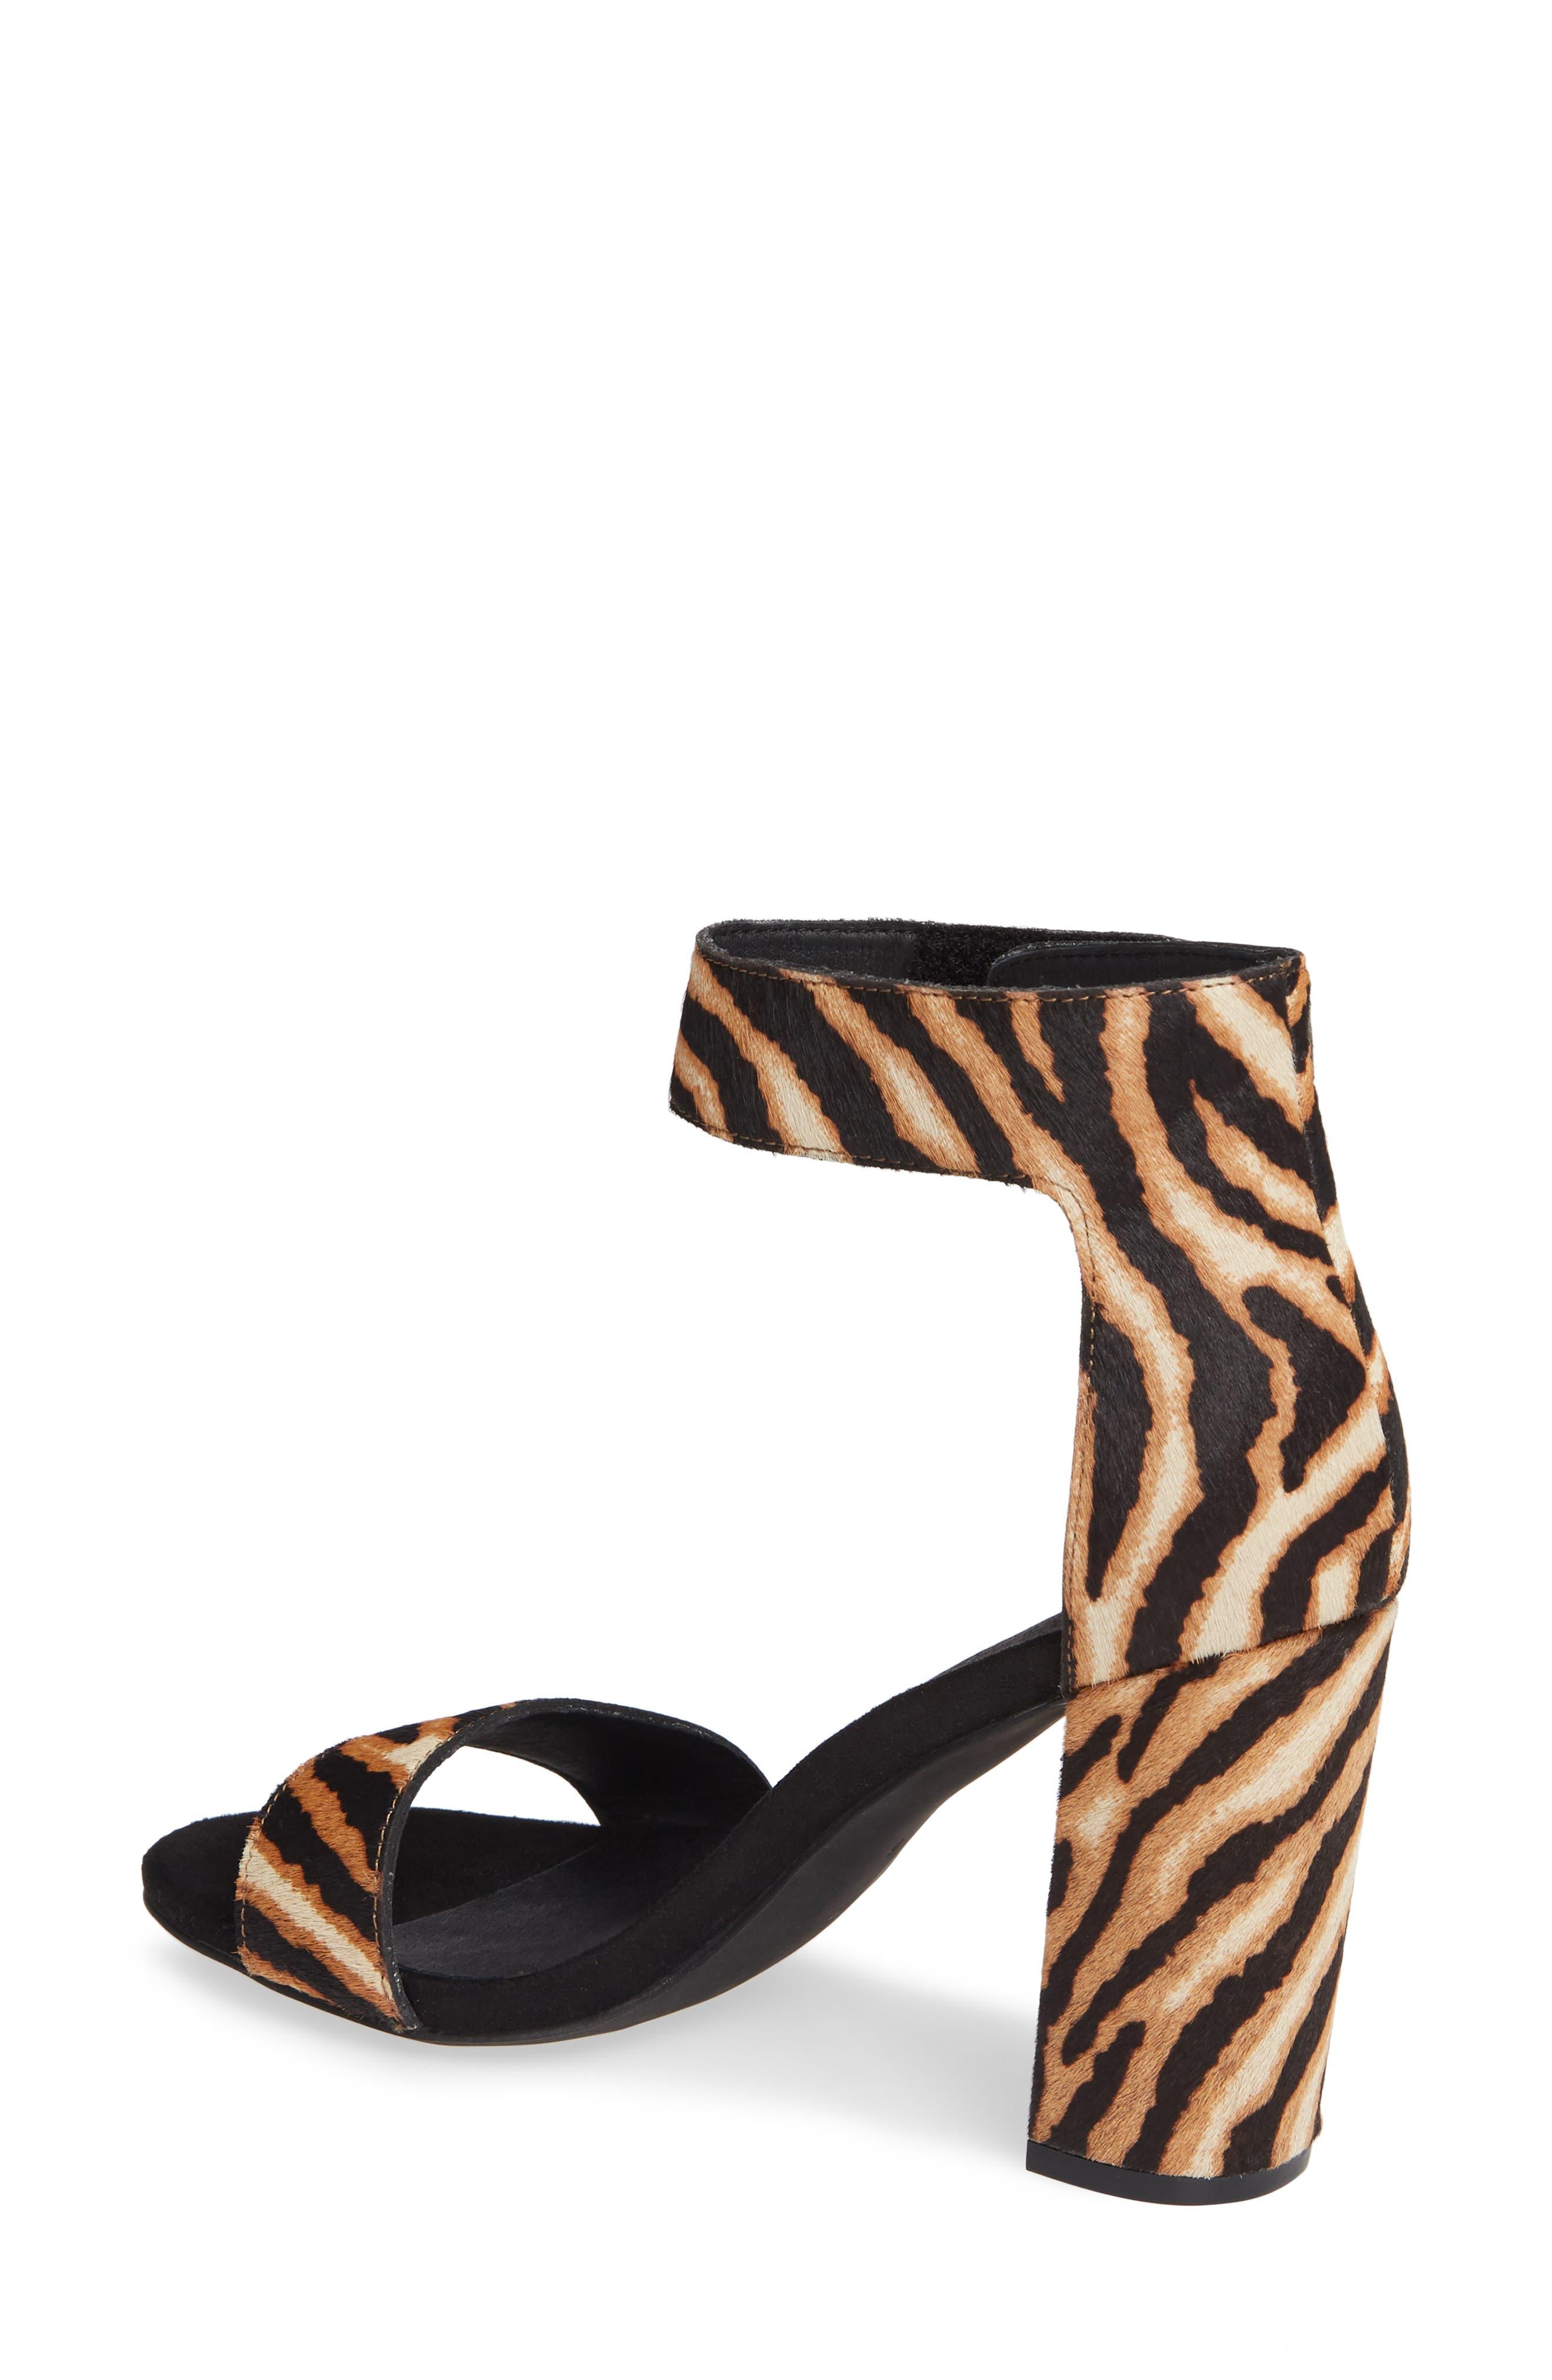 JEFFREY CAMPBELL, Lindsay Genuine Calf Hair Ankle Strap Sandal, Alternate thumbnail 2, color, BEIGE ZEBRA PRINT LEATHER